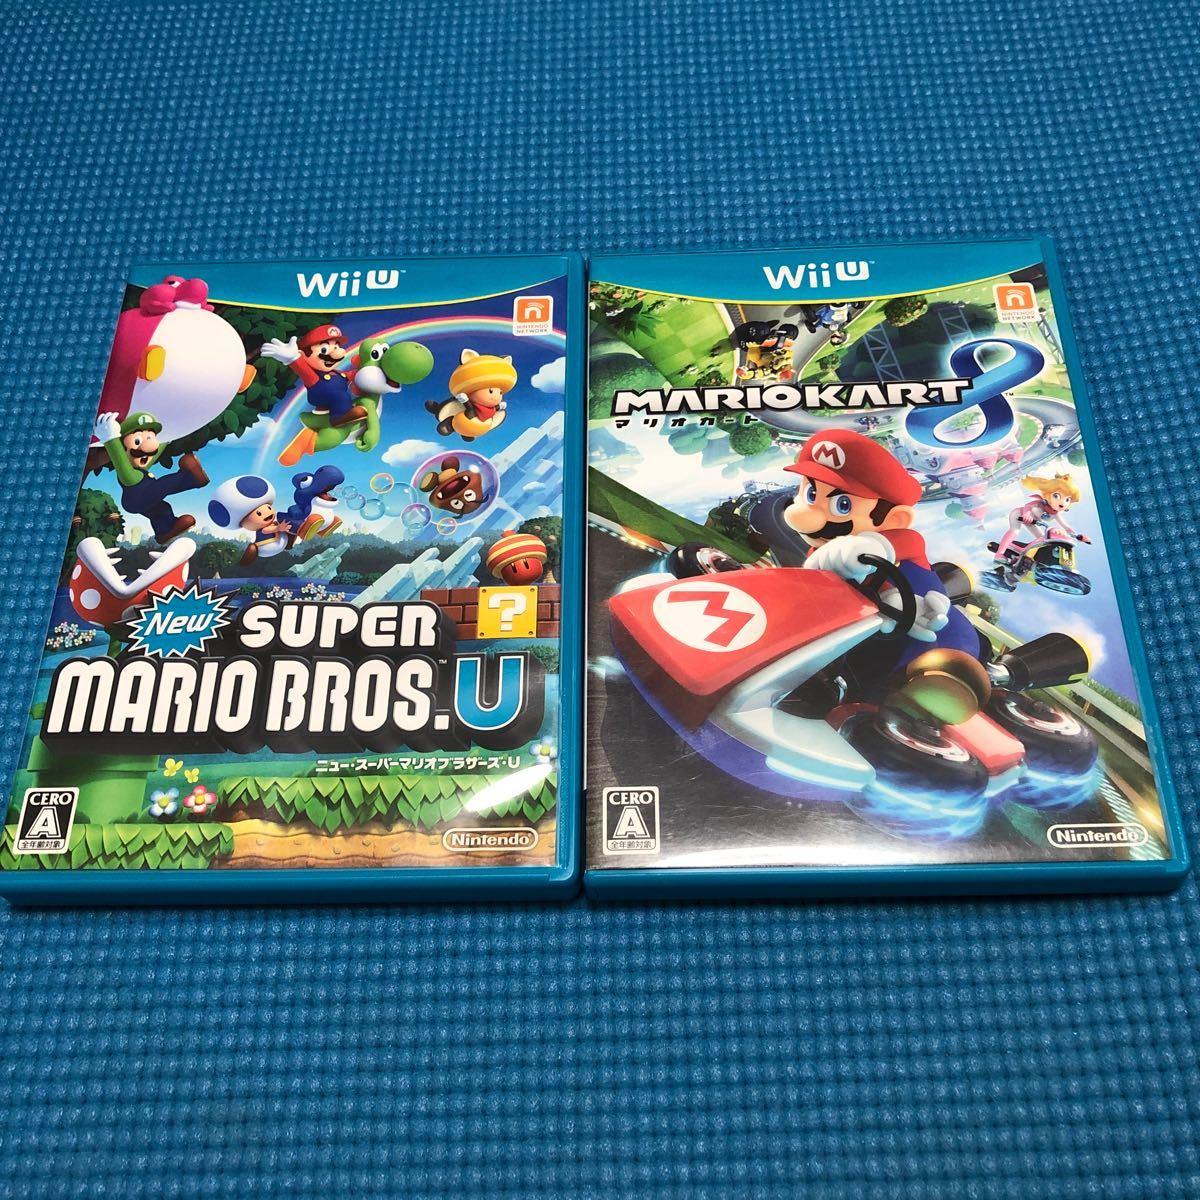 【Wii U】 マリオカート8、ニュースーパーマリオブラザーズUセット